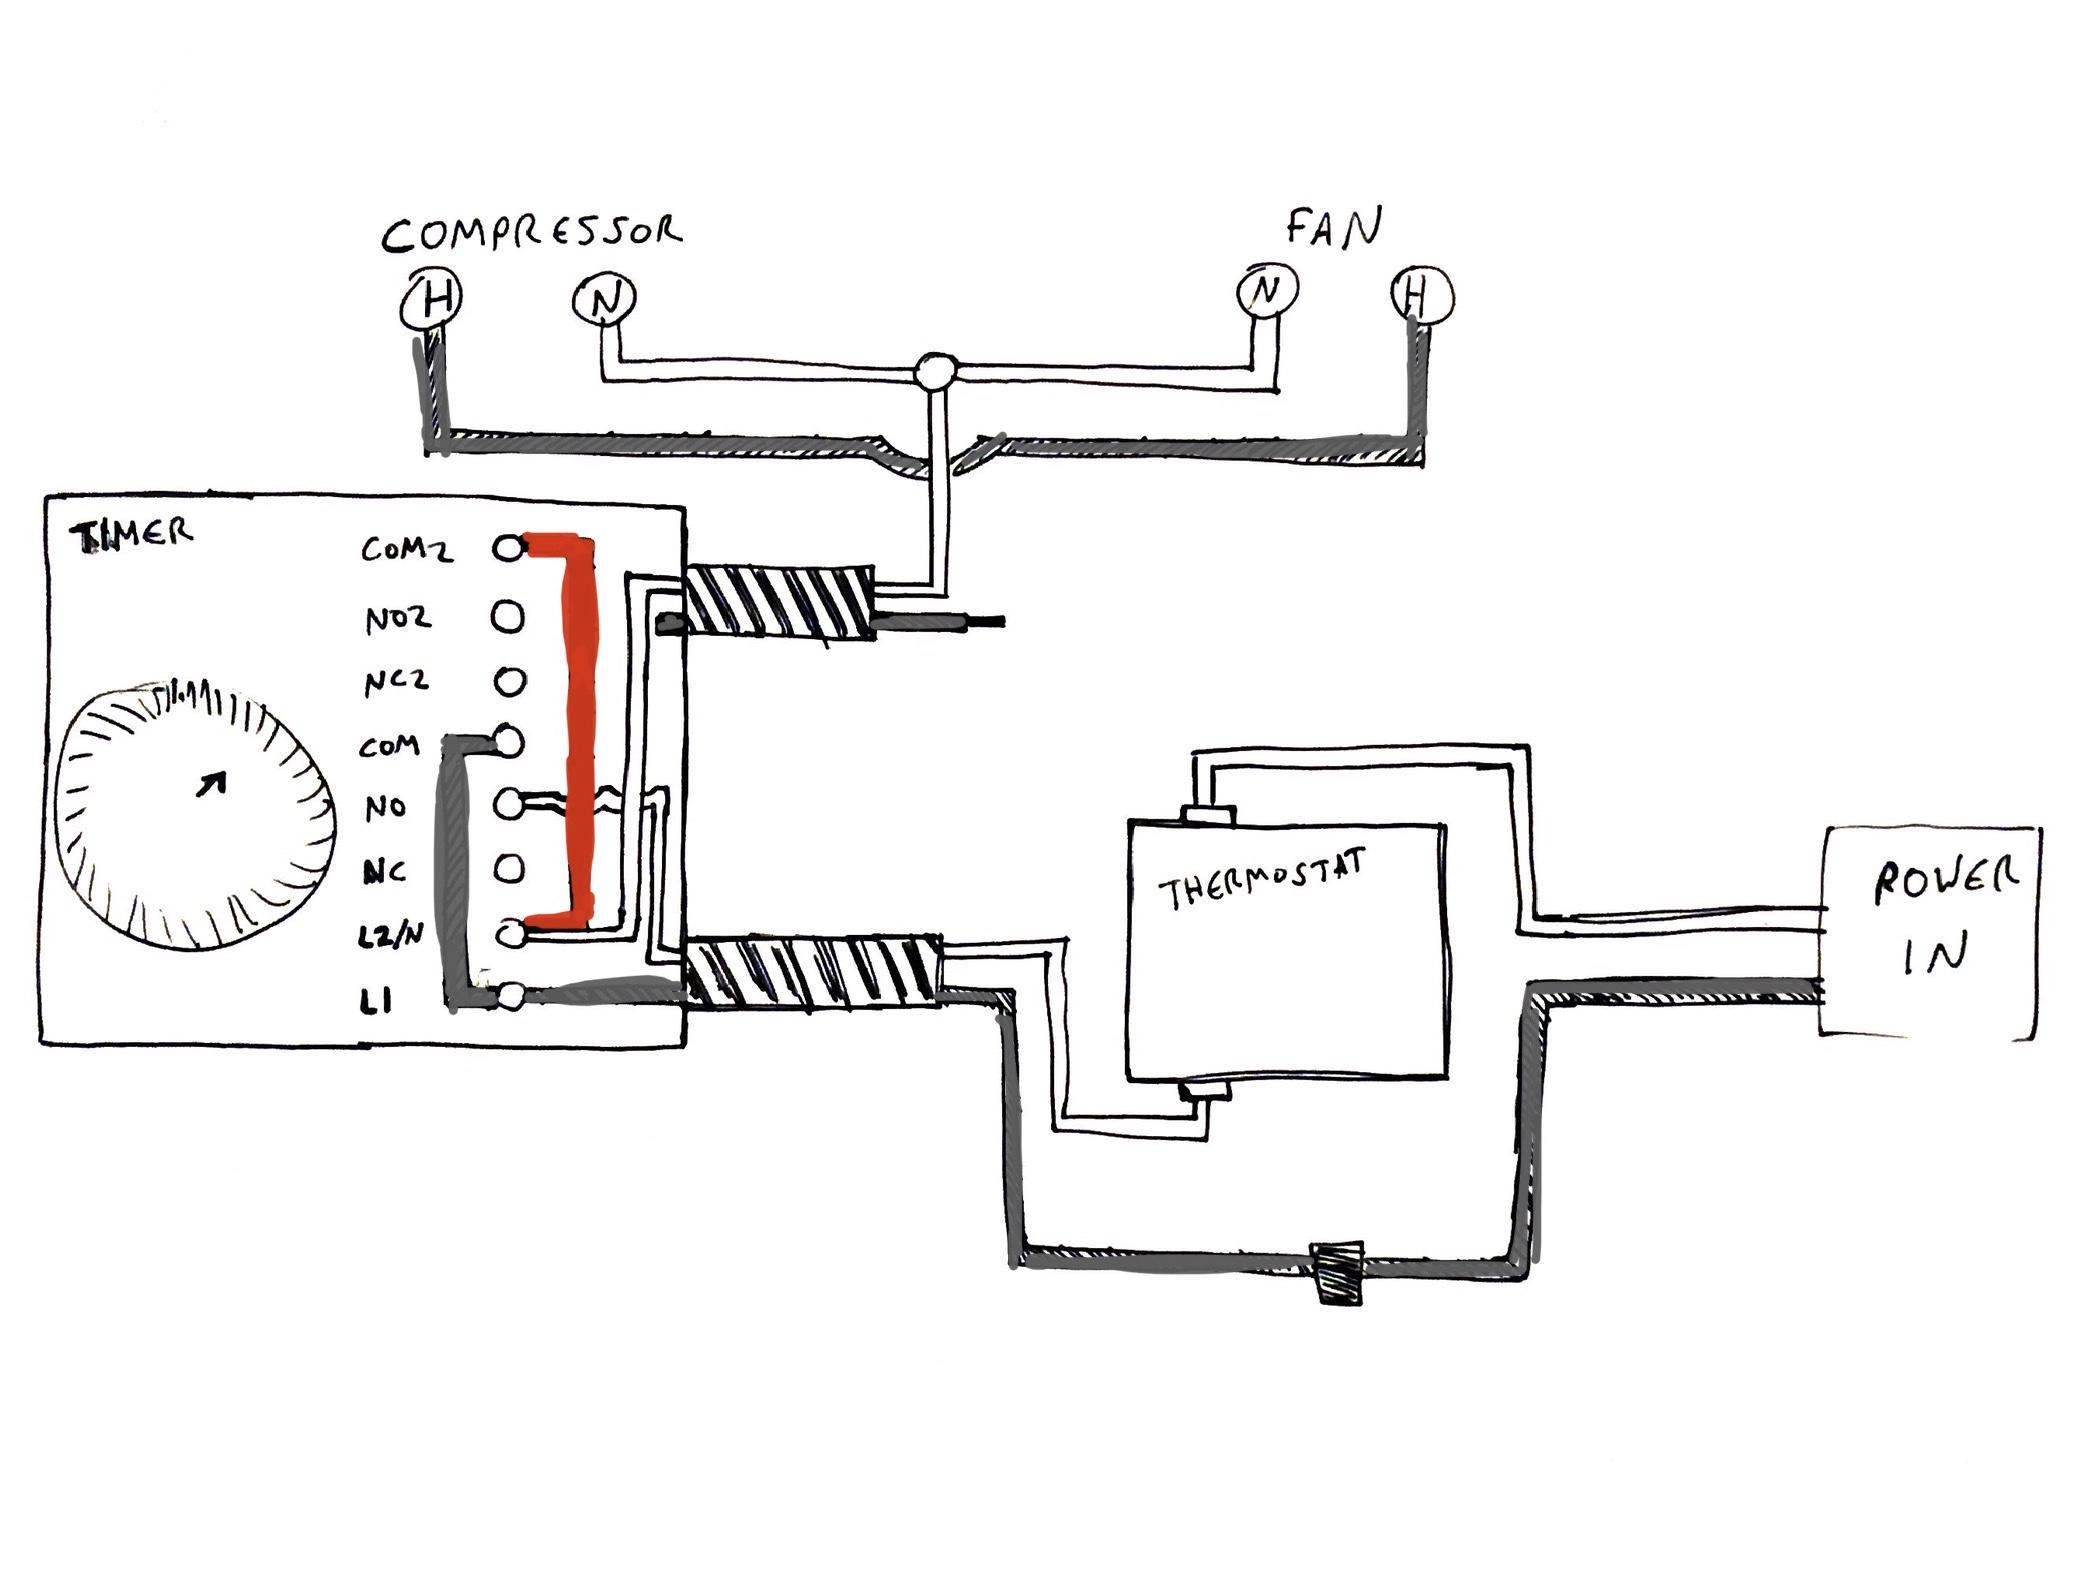 refrigerator wiring diagram compressor wiring for refrigerator thermostat and compressor electrical refrigerator compressor starter wiring diagram wiring for refrigerator thermostat and